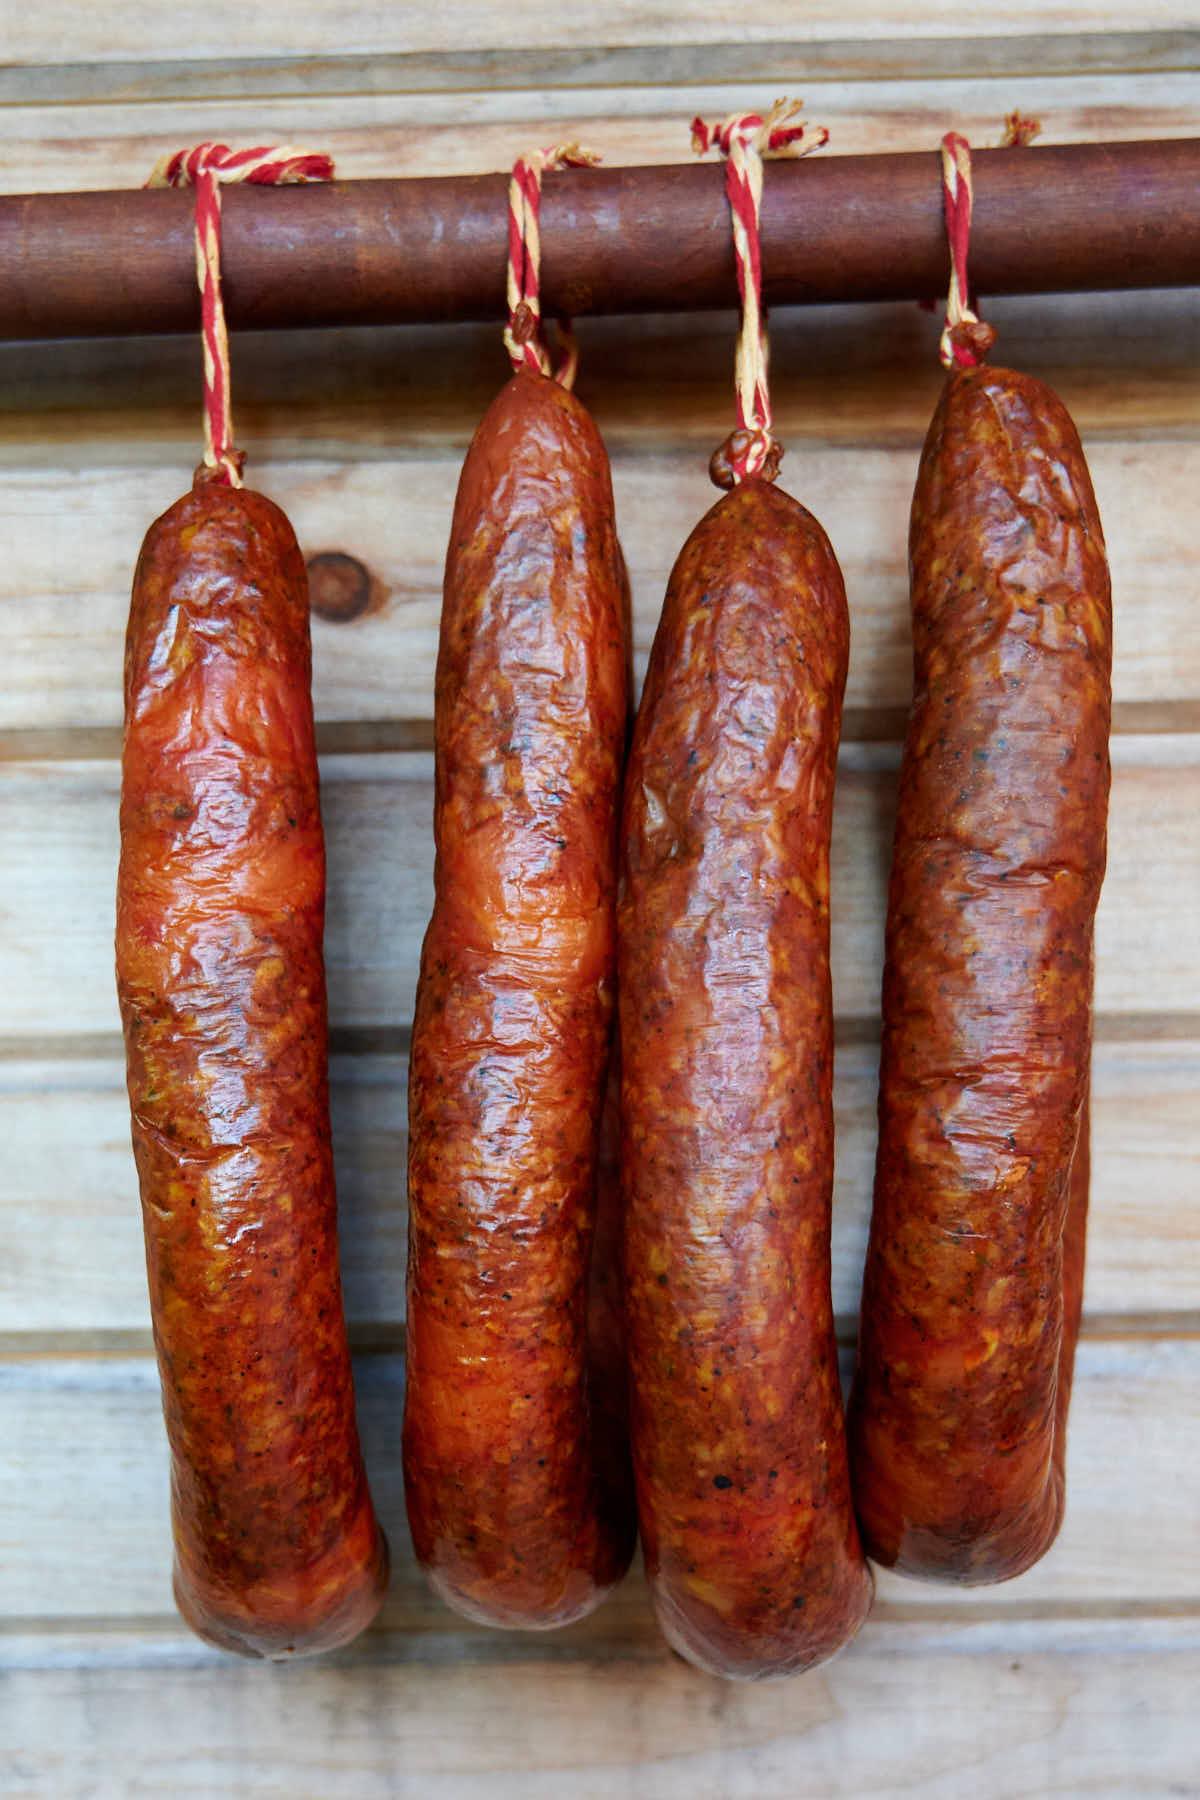 Chicken Andouille Sausage hanging on a smoking stick